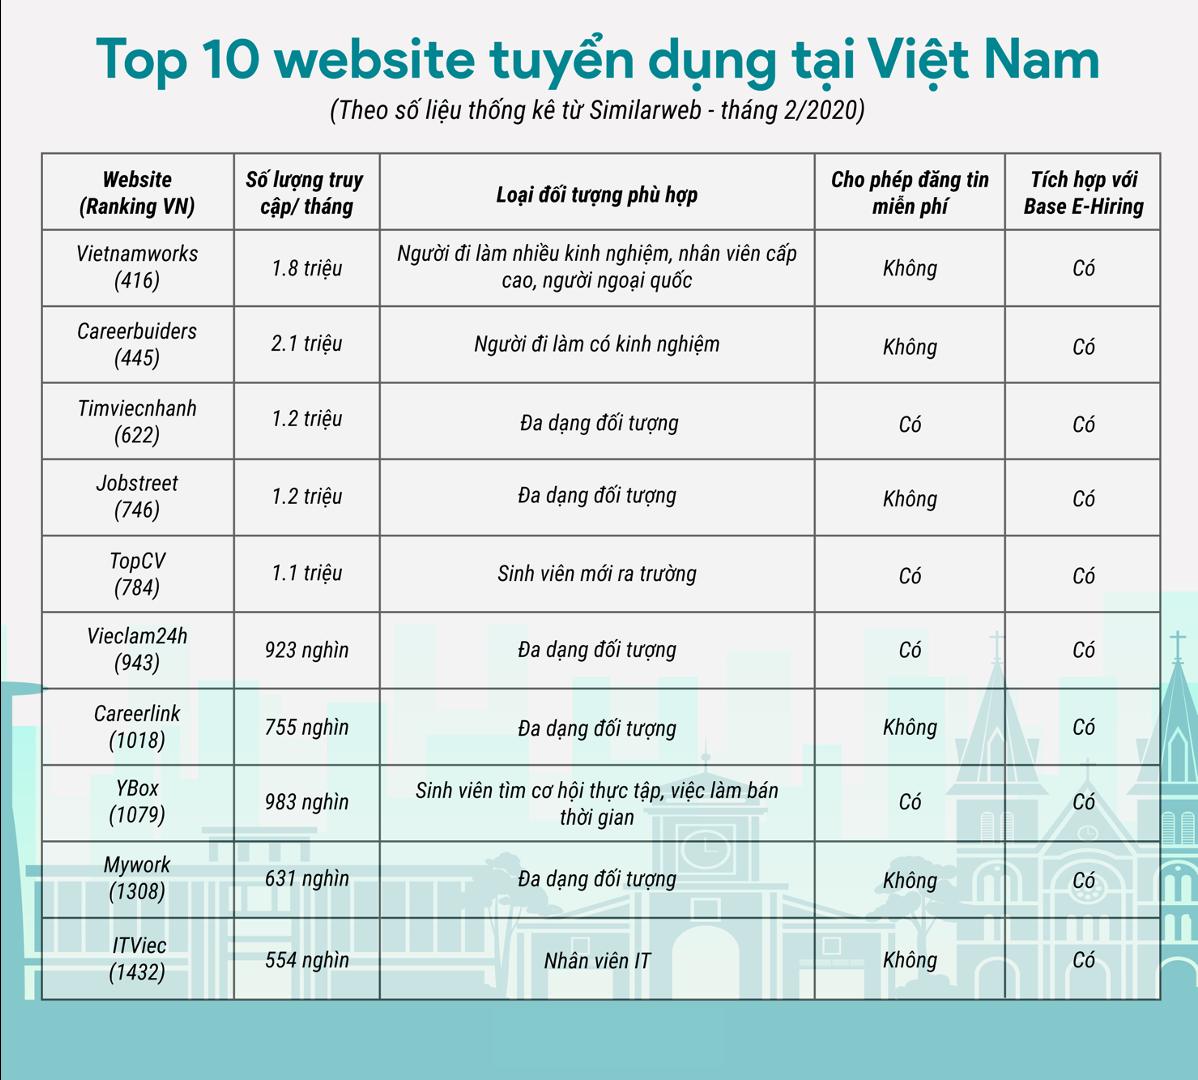 Recruitery - top 10 website tuyển dụng tại Việt Nam